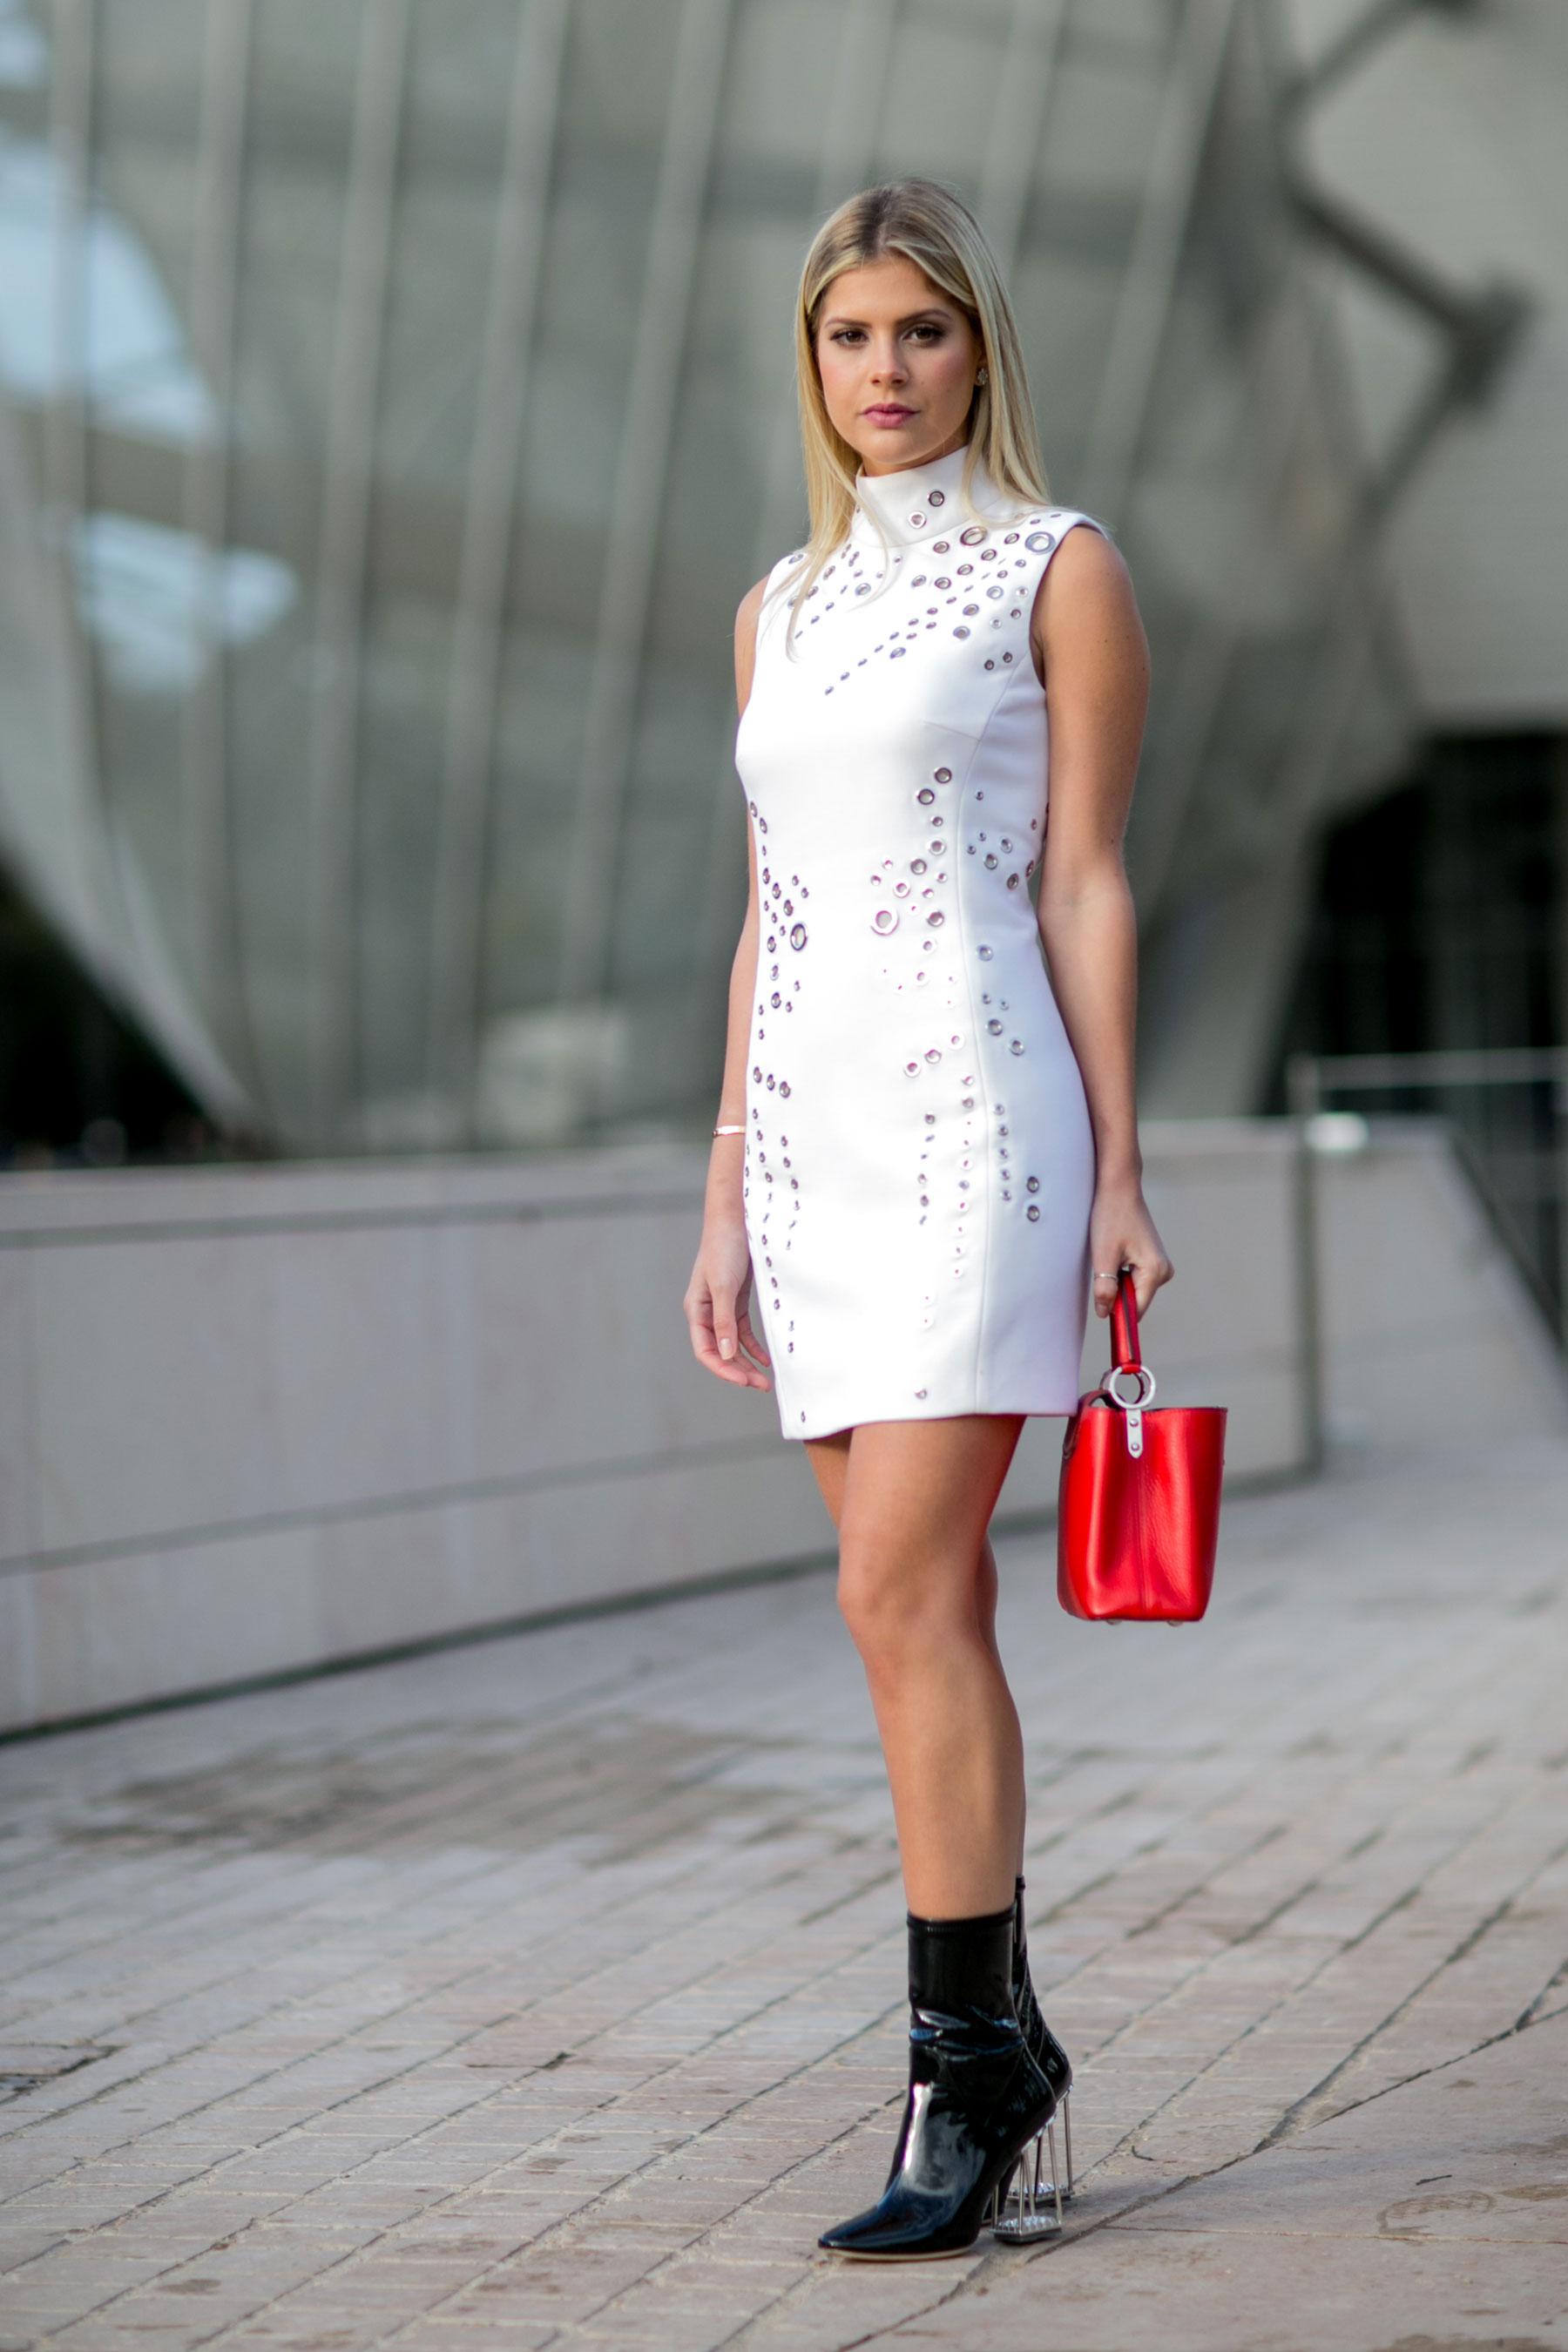 Paris-fashion-week-street-style-day-9-october-2015060